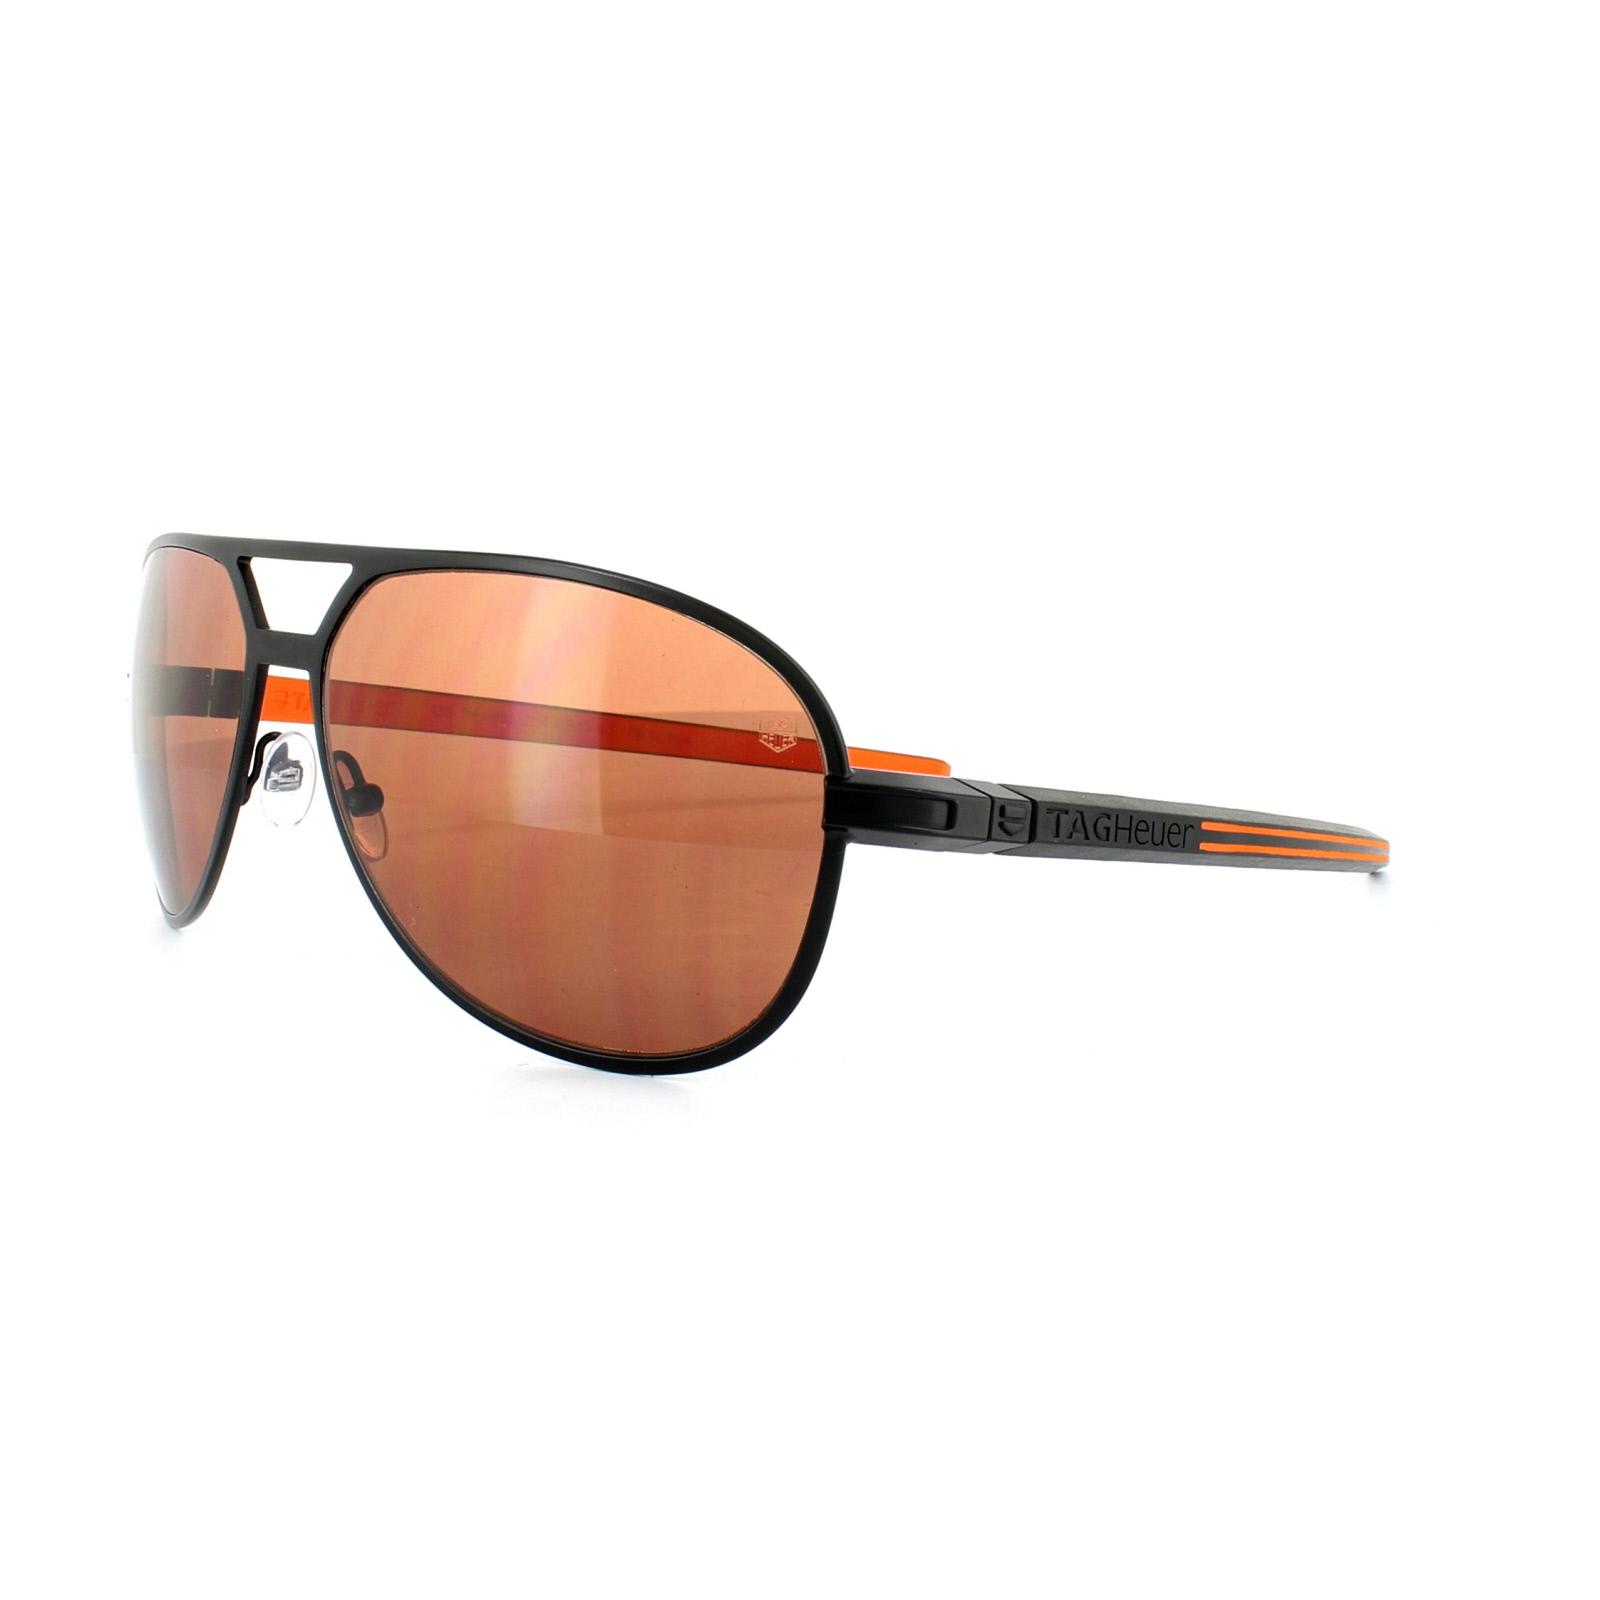 74e24799764c Sentinel Tag Heuer Sunglasses 0986 Senna Racing 204 Black Orange HD Driving  Brown